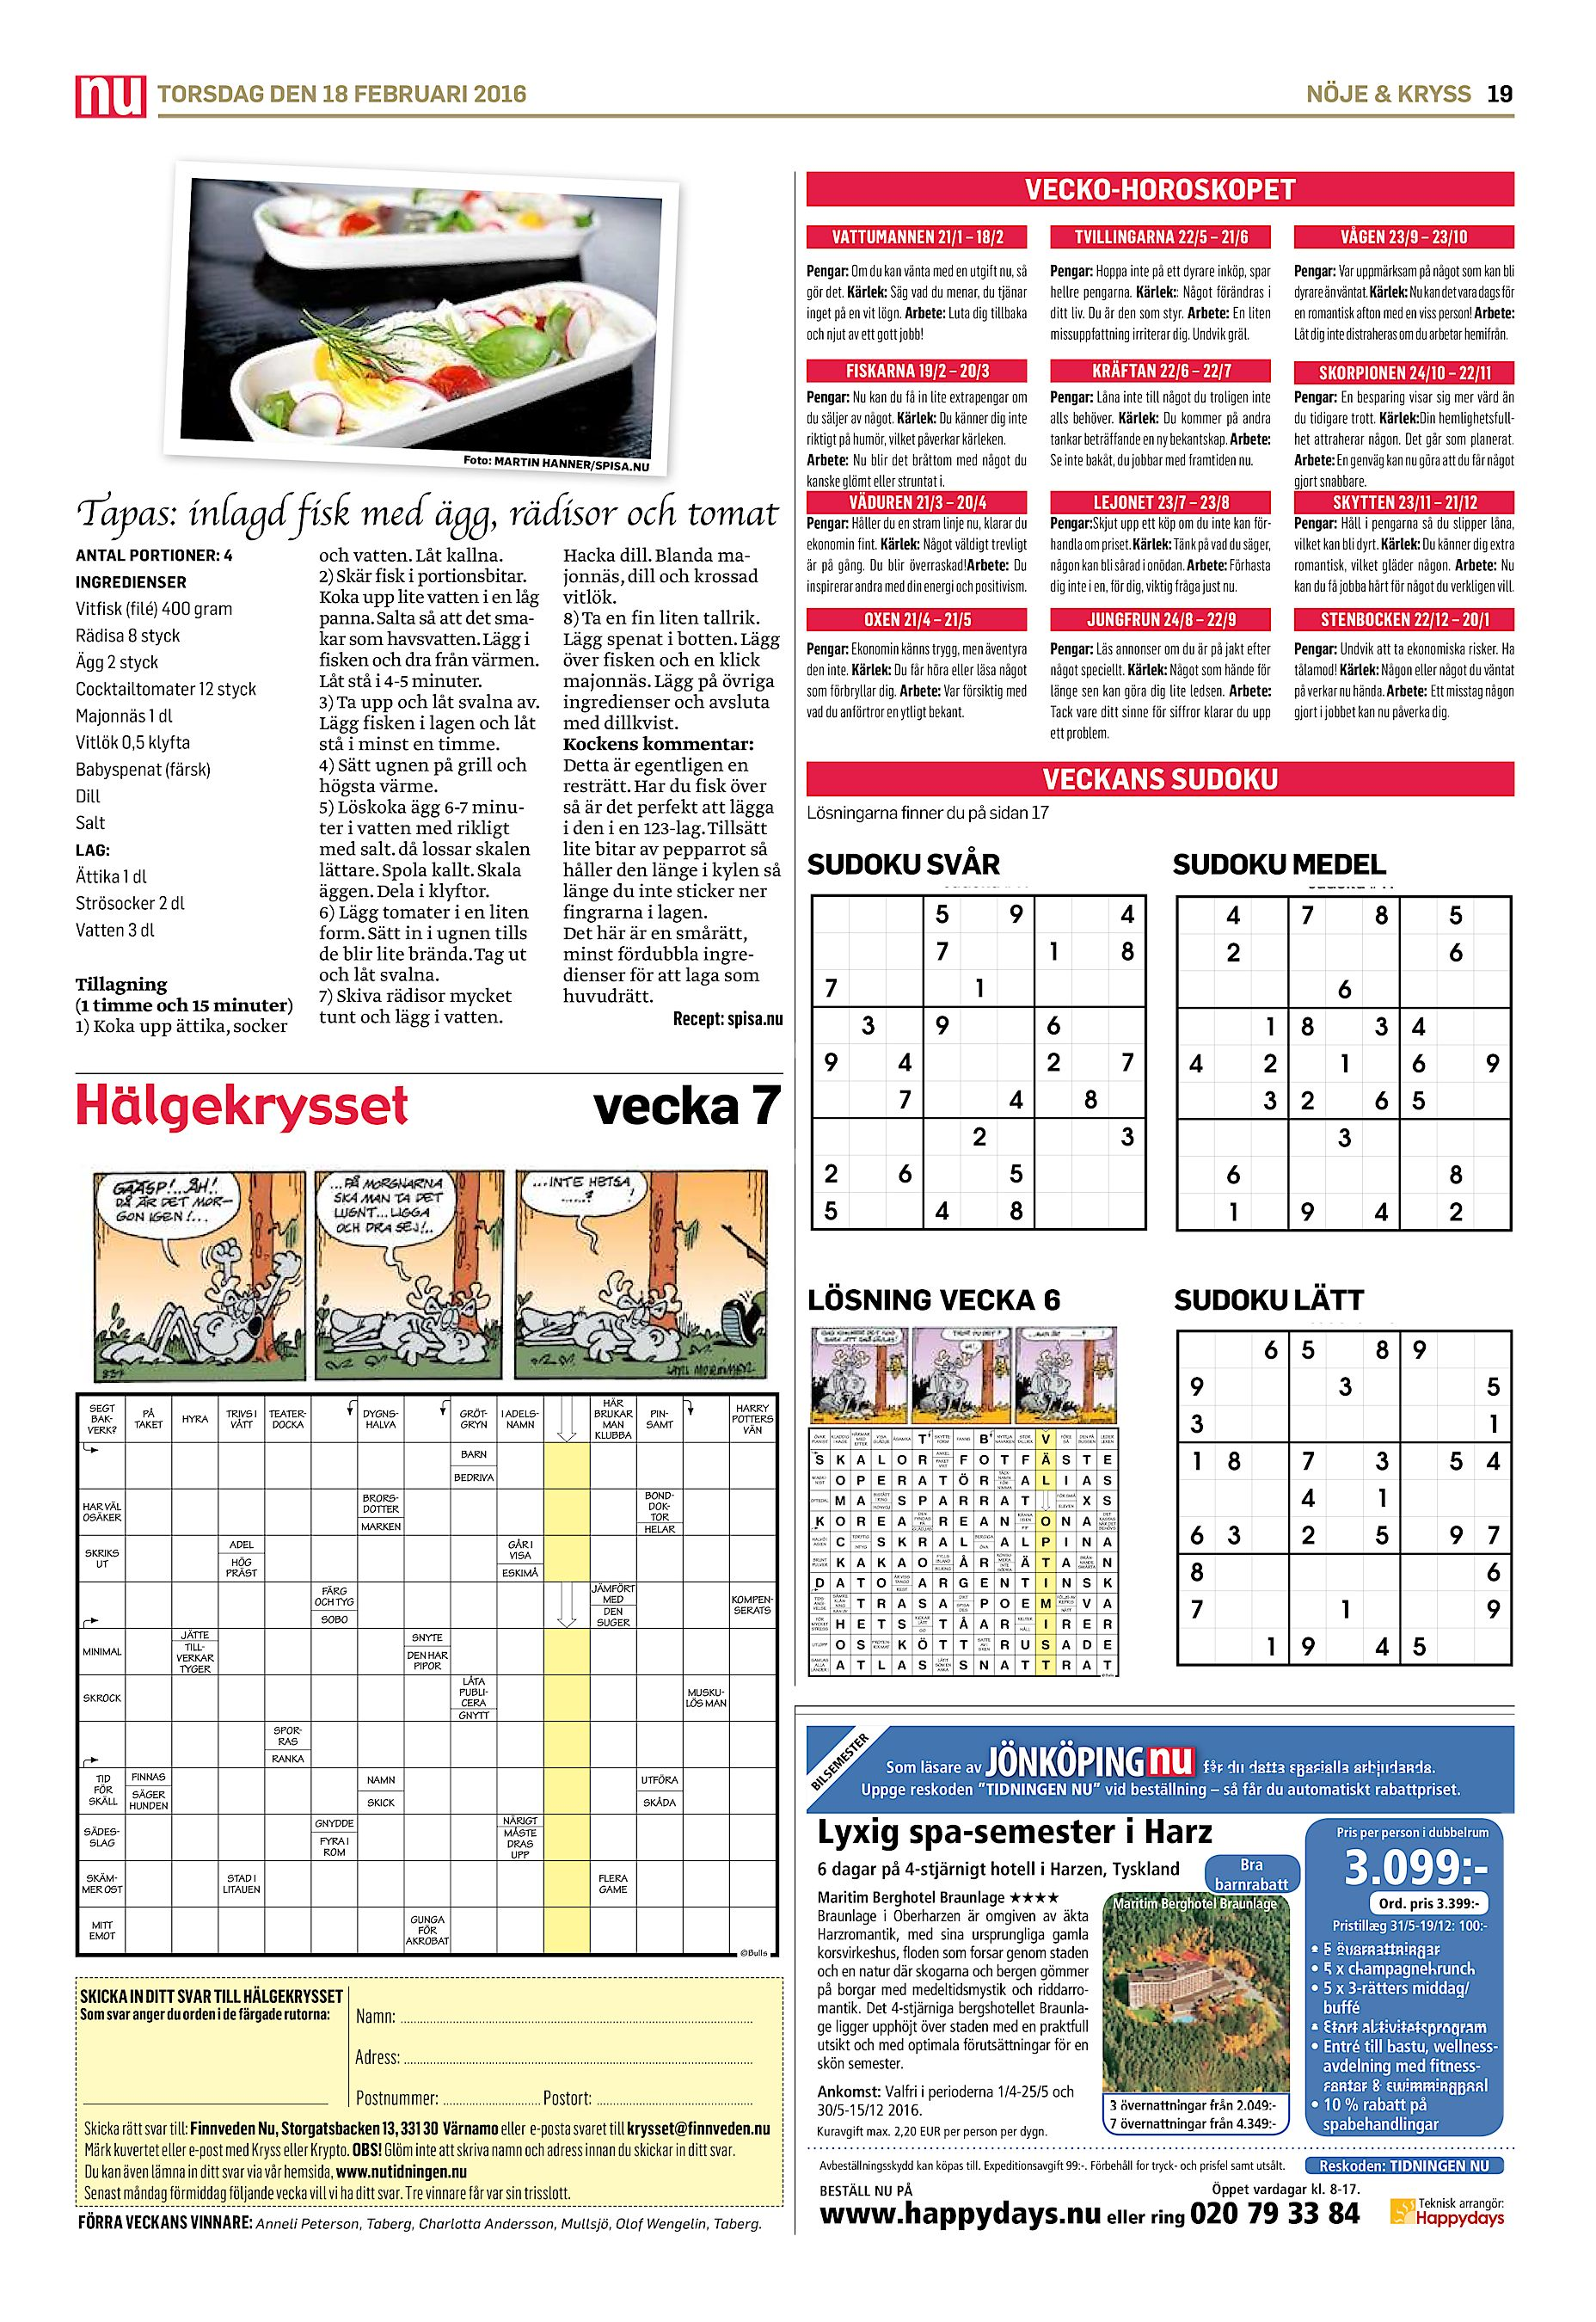 Horoskop match gör Sri Lanka